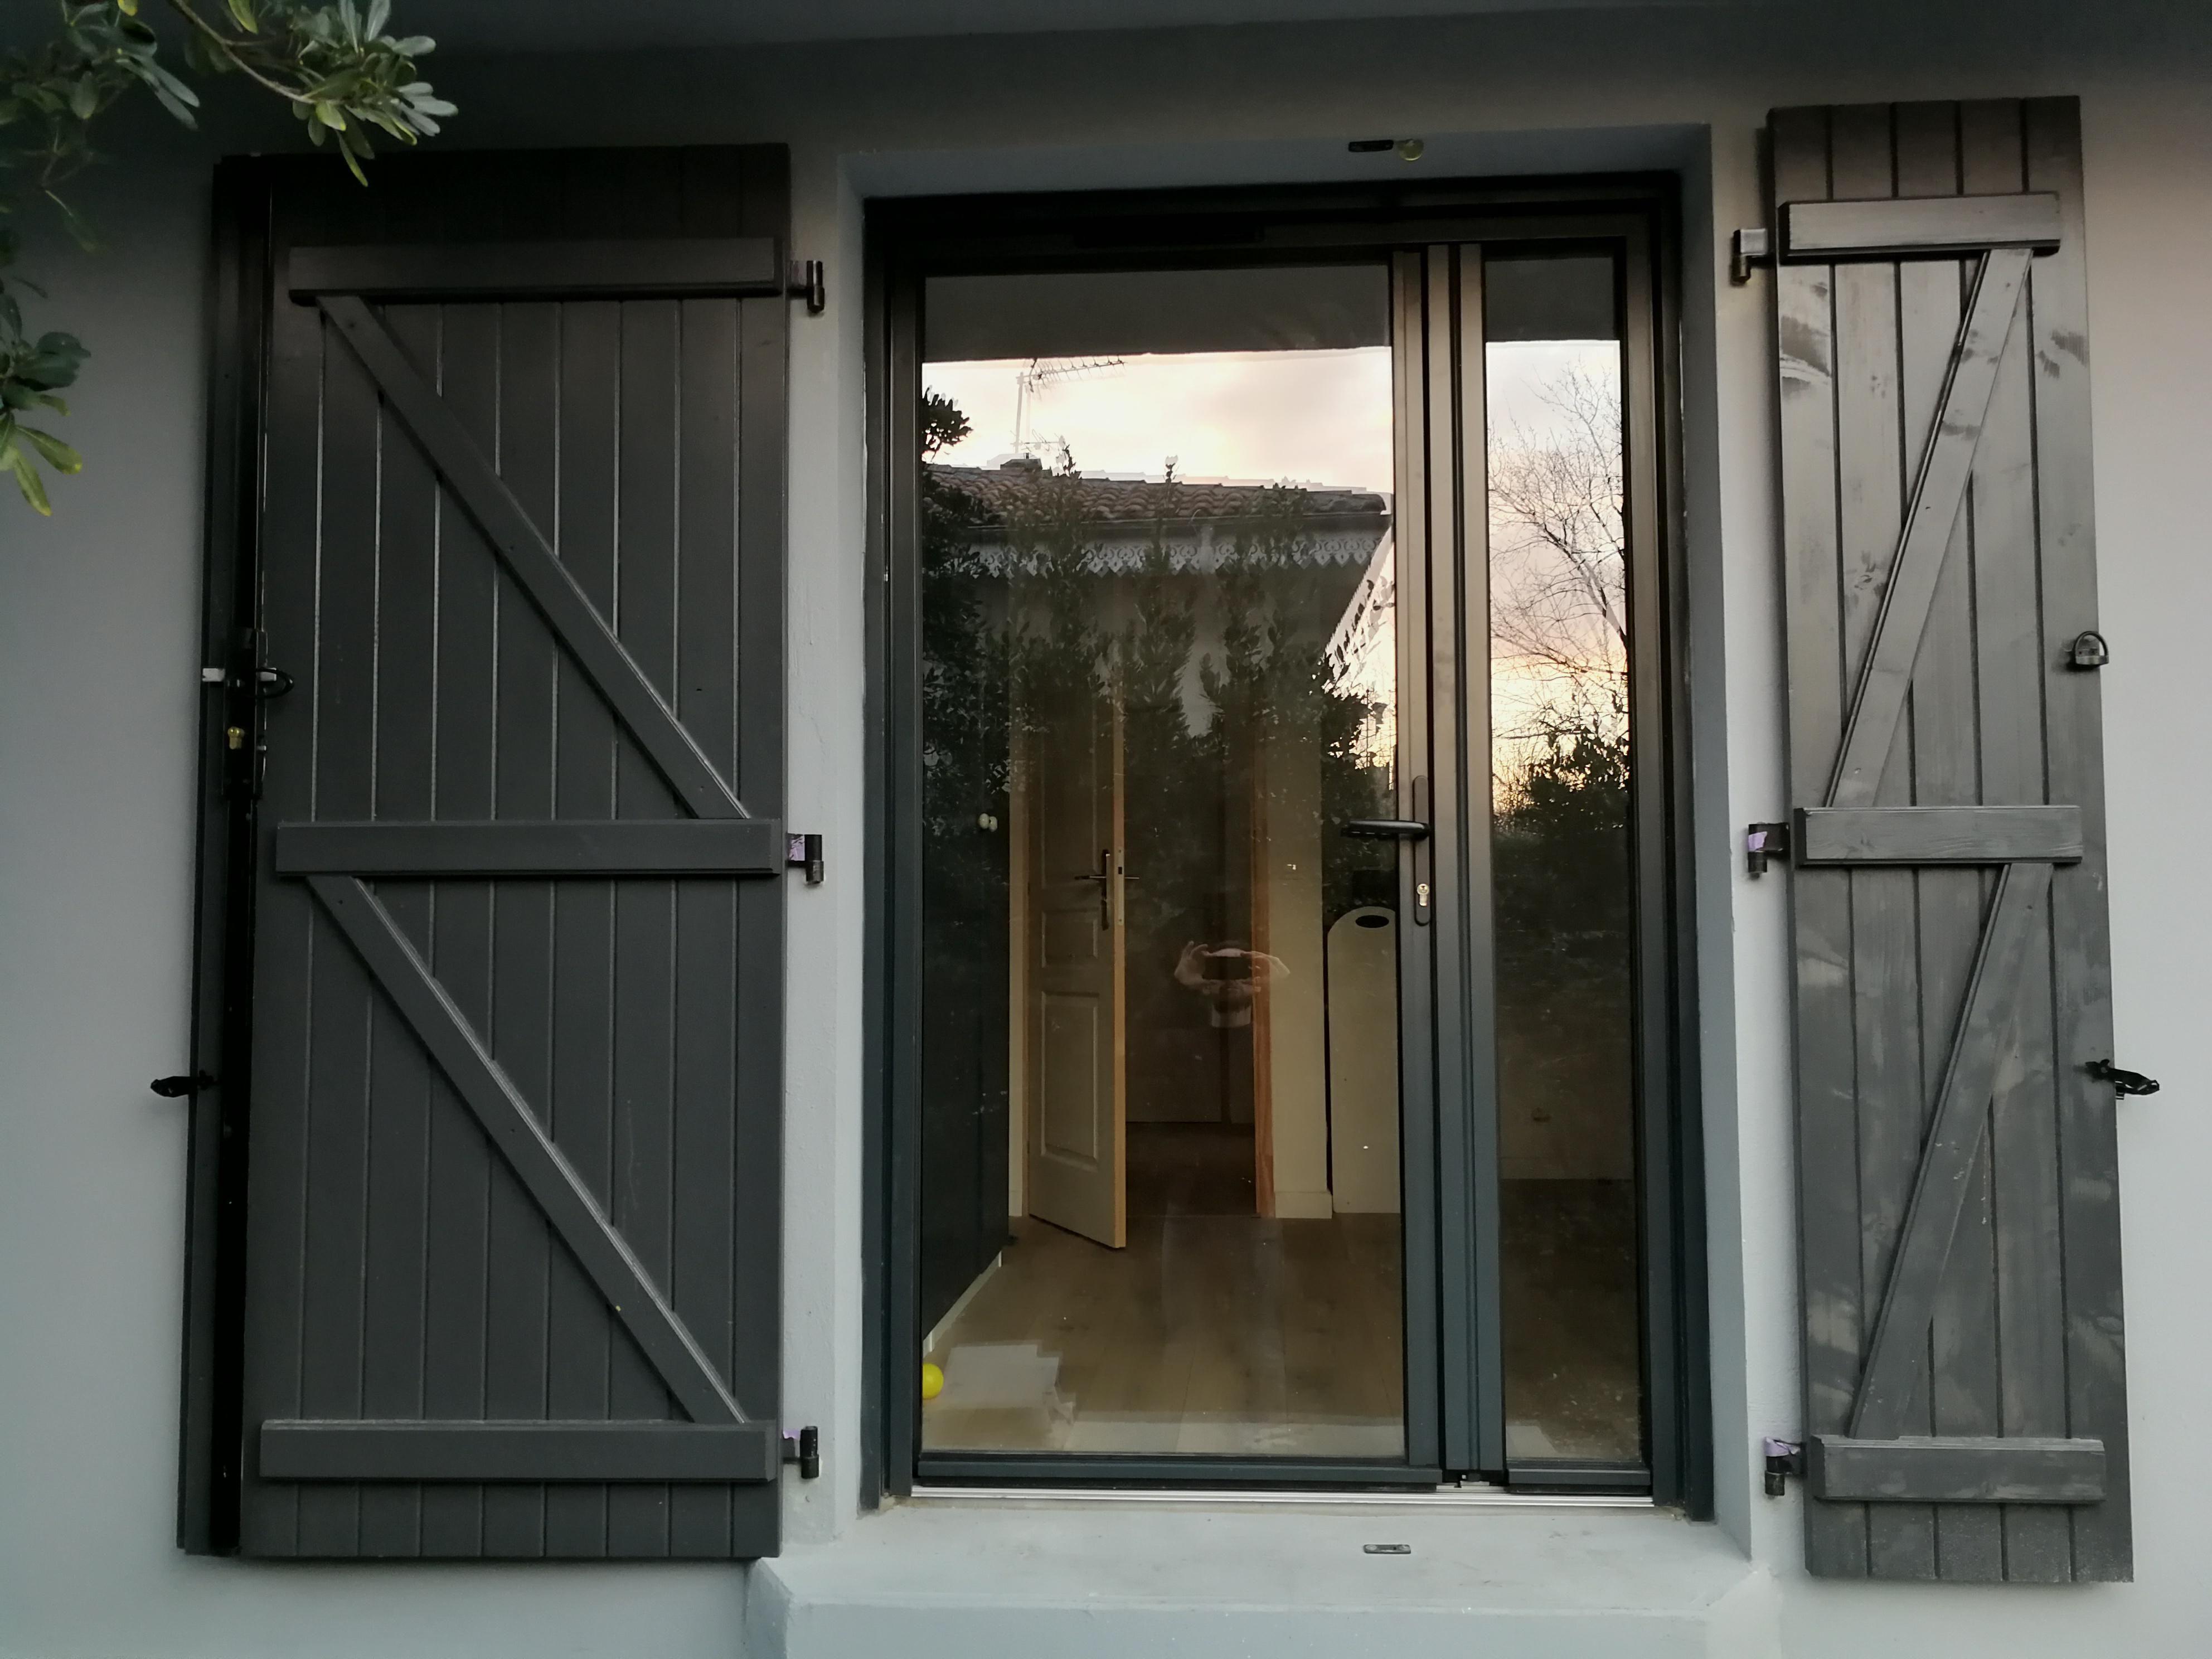 Fourniture Et Pose Dune Porte Fenêtre Tierce En Alu Ral 7016